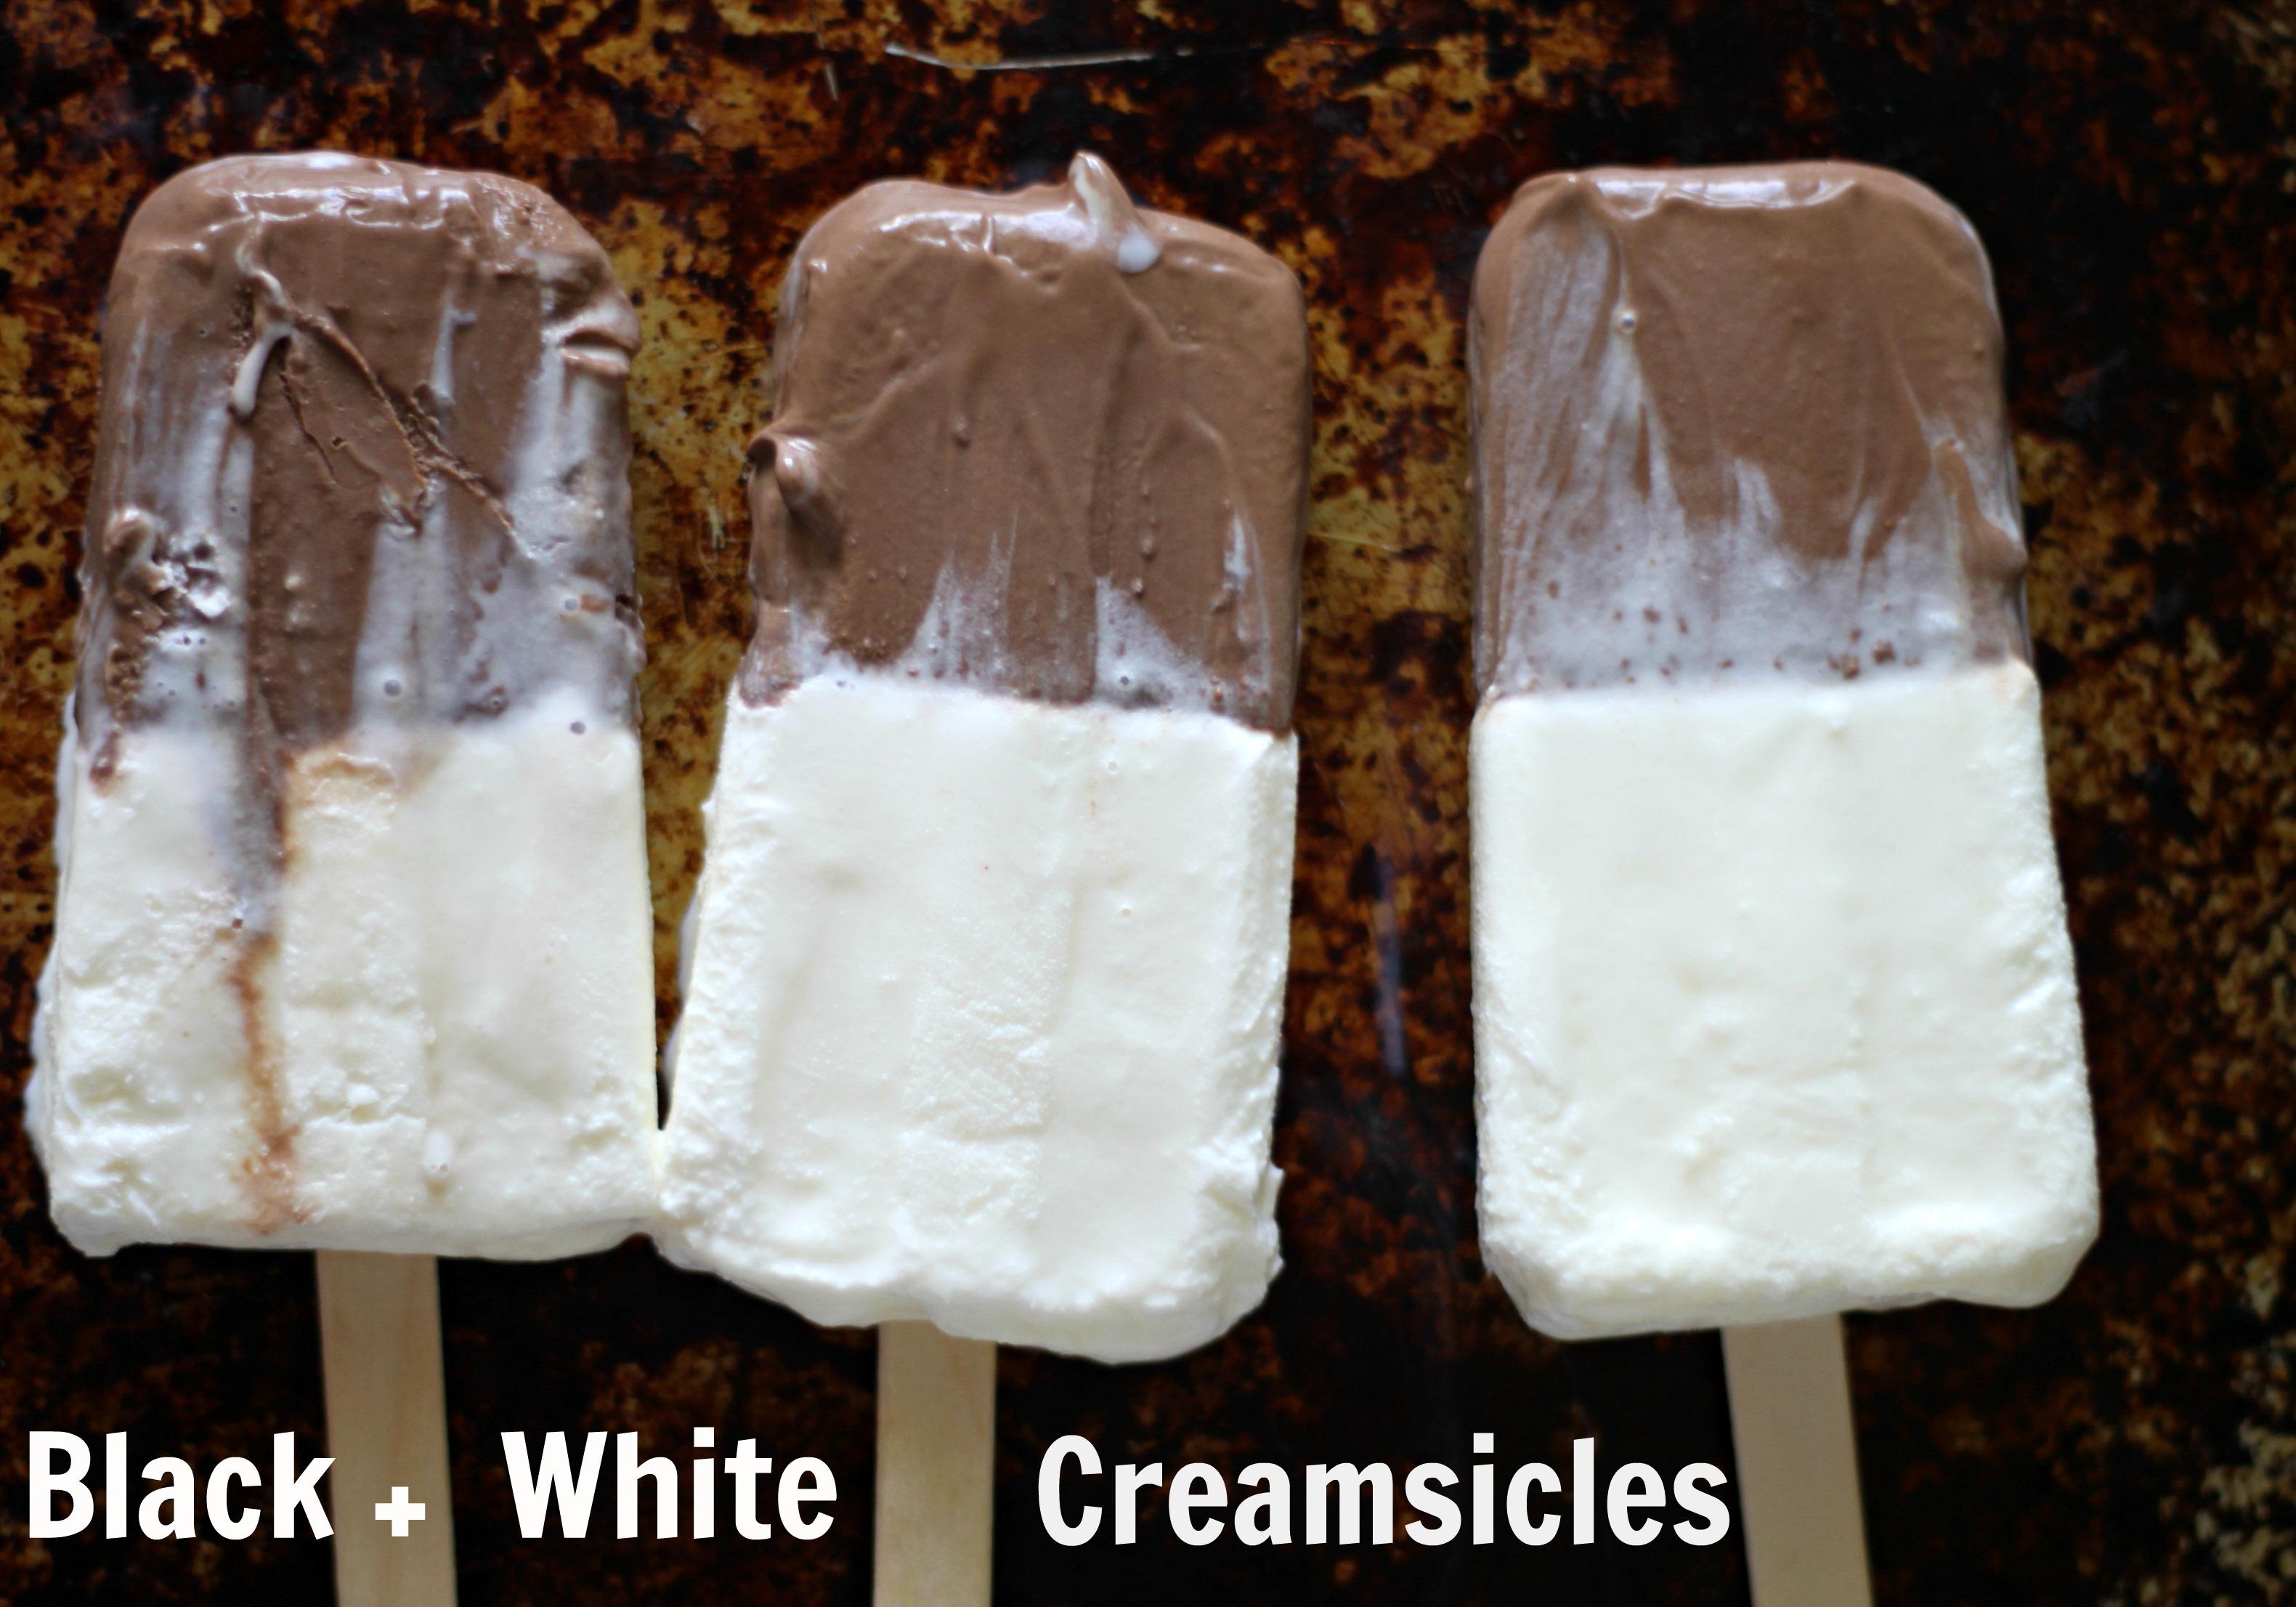 Black + White Creamsicles